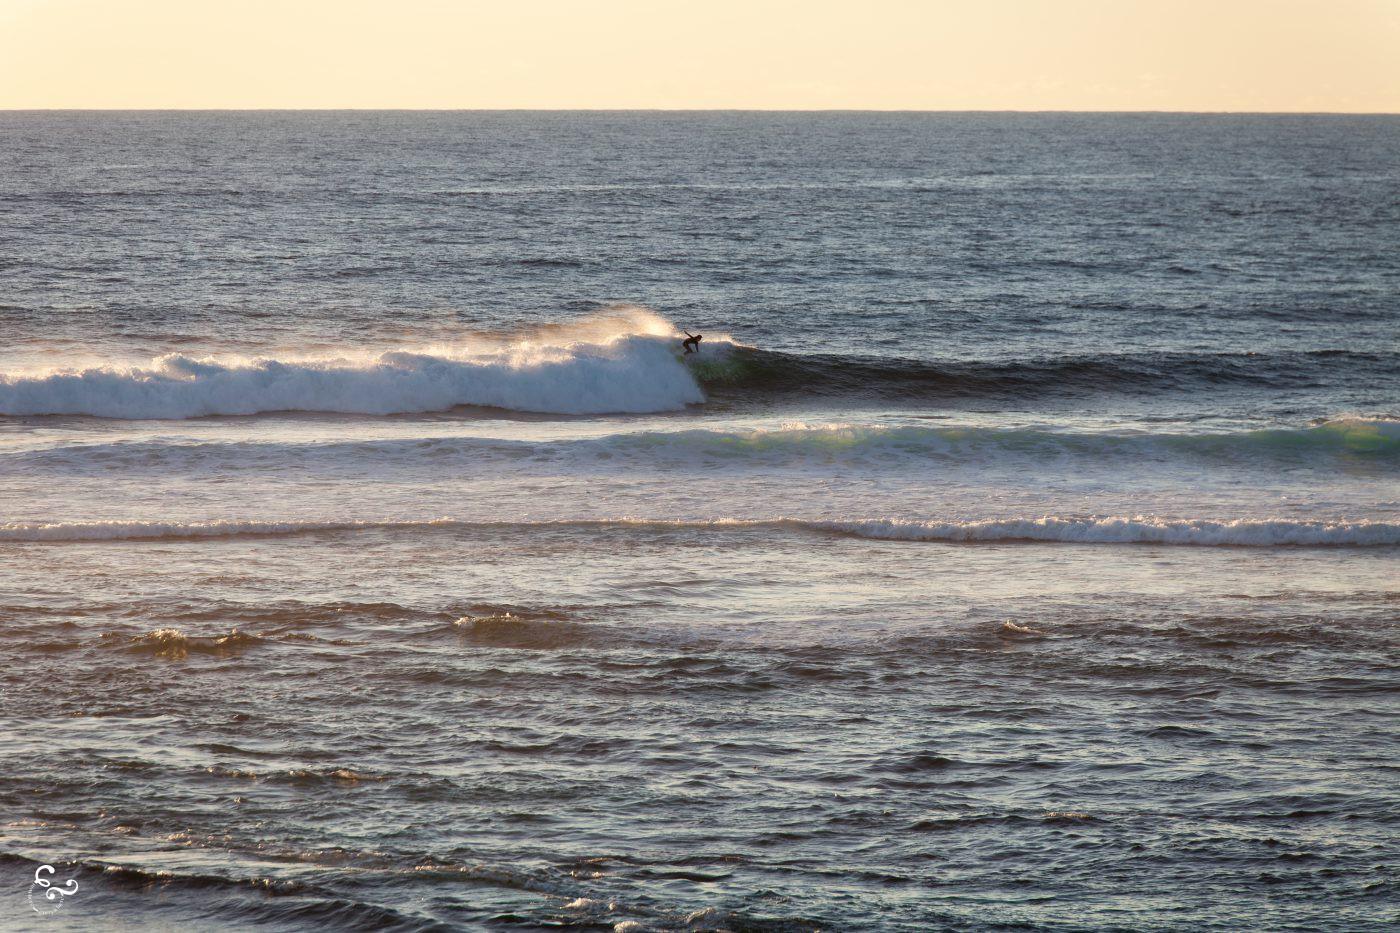 Margaret River Beaches Surfing Western Australia Perth Nowhere & Everywhere Lis Dingjan Photography Prints #justanotherdayinwa South West